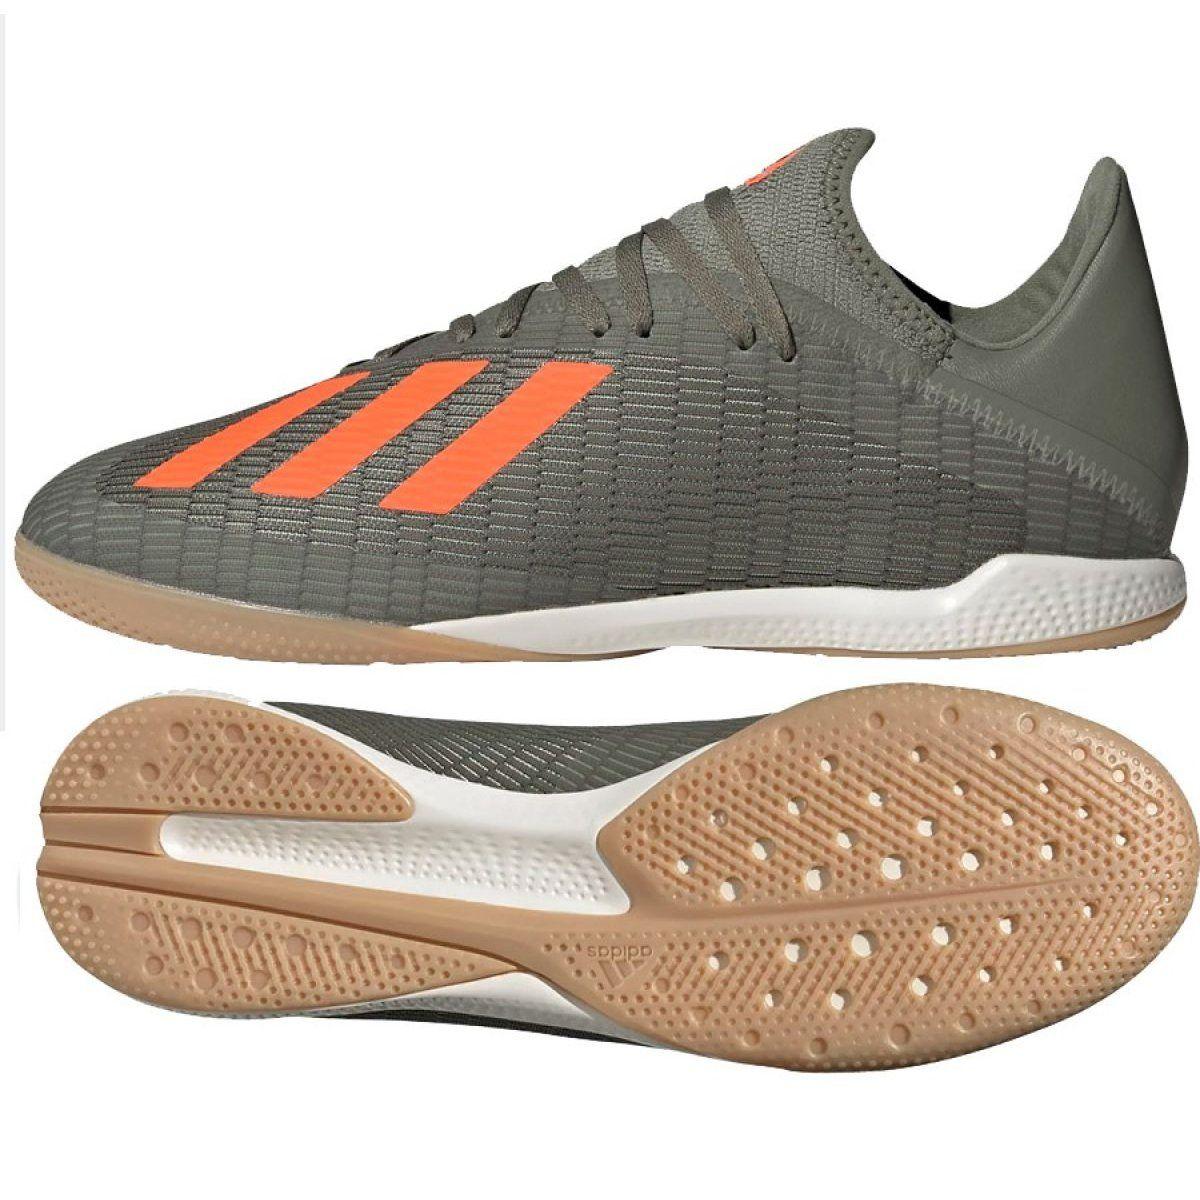 Buty Halowe Adidas X 19 3 In M Ef8367 Szare Szare Indoor Shoe Adidas Shoes